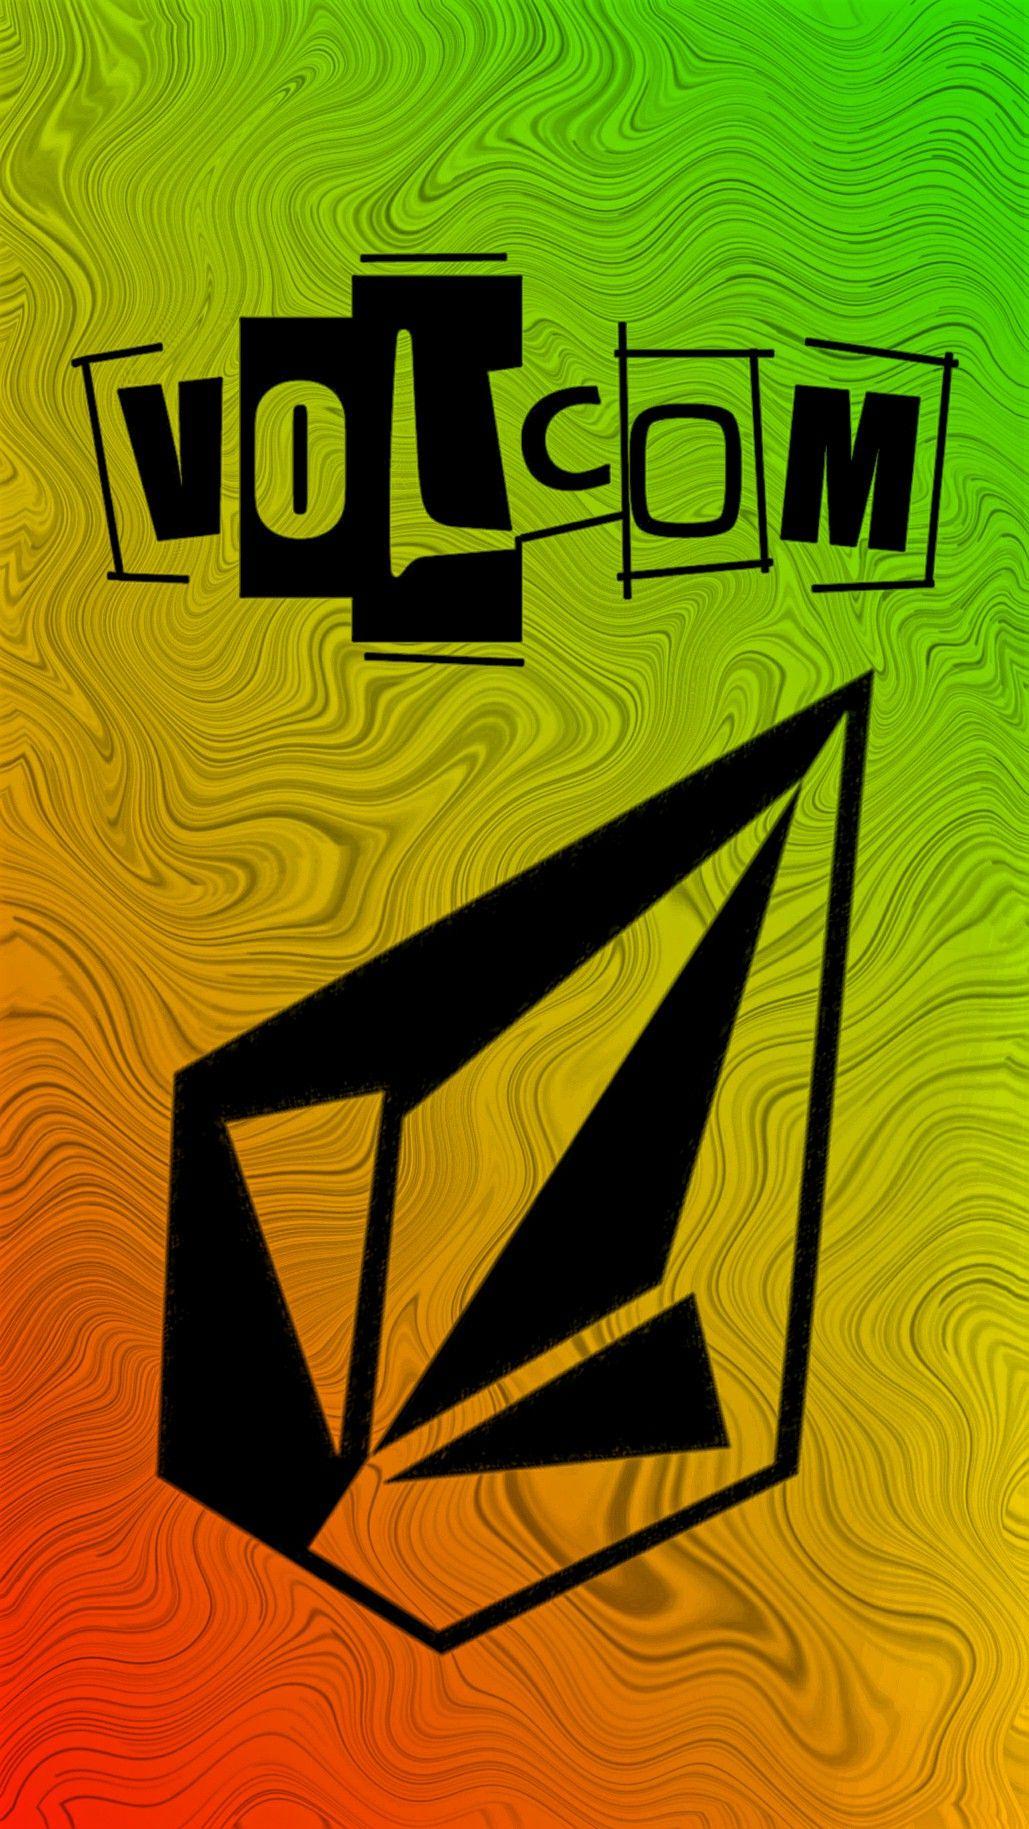 Volcom Wallpaper Wallpaper Stone Wallpaper Volcom